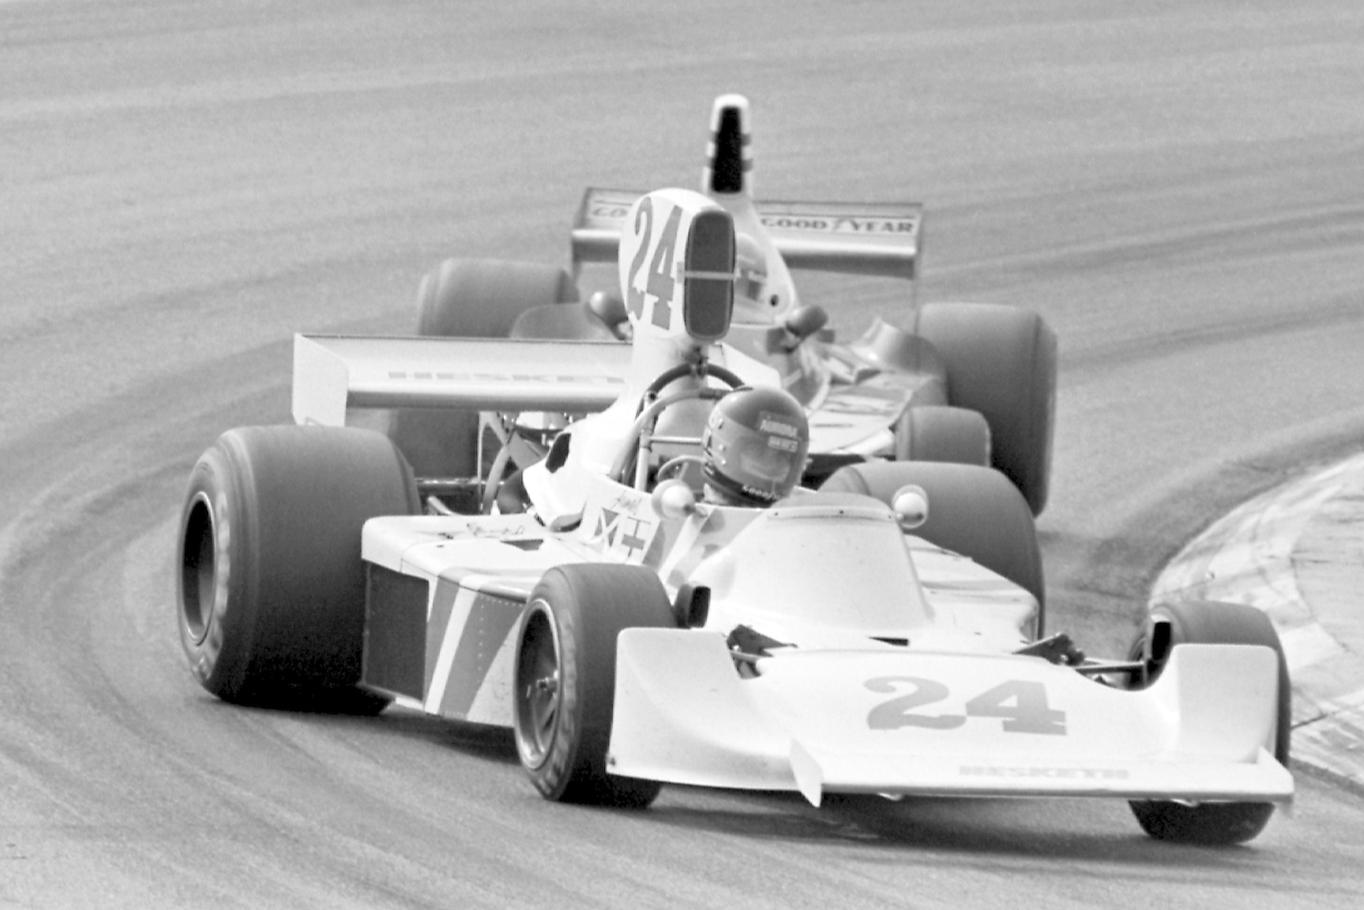 James Hunt leads Niki LAuda in the 1975 Dutch Grand Prix at Zandvoort